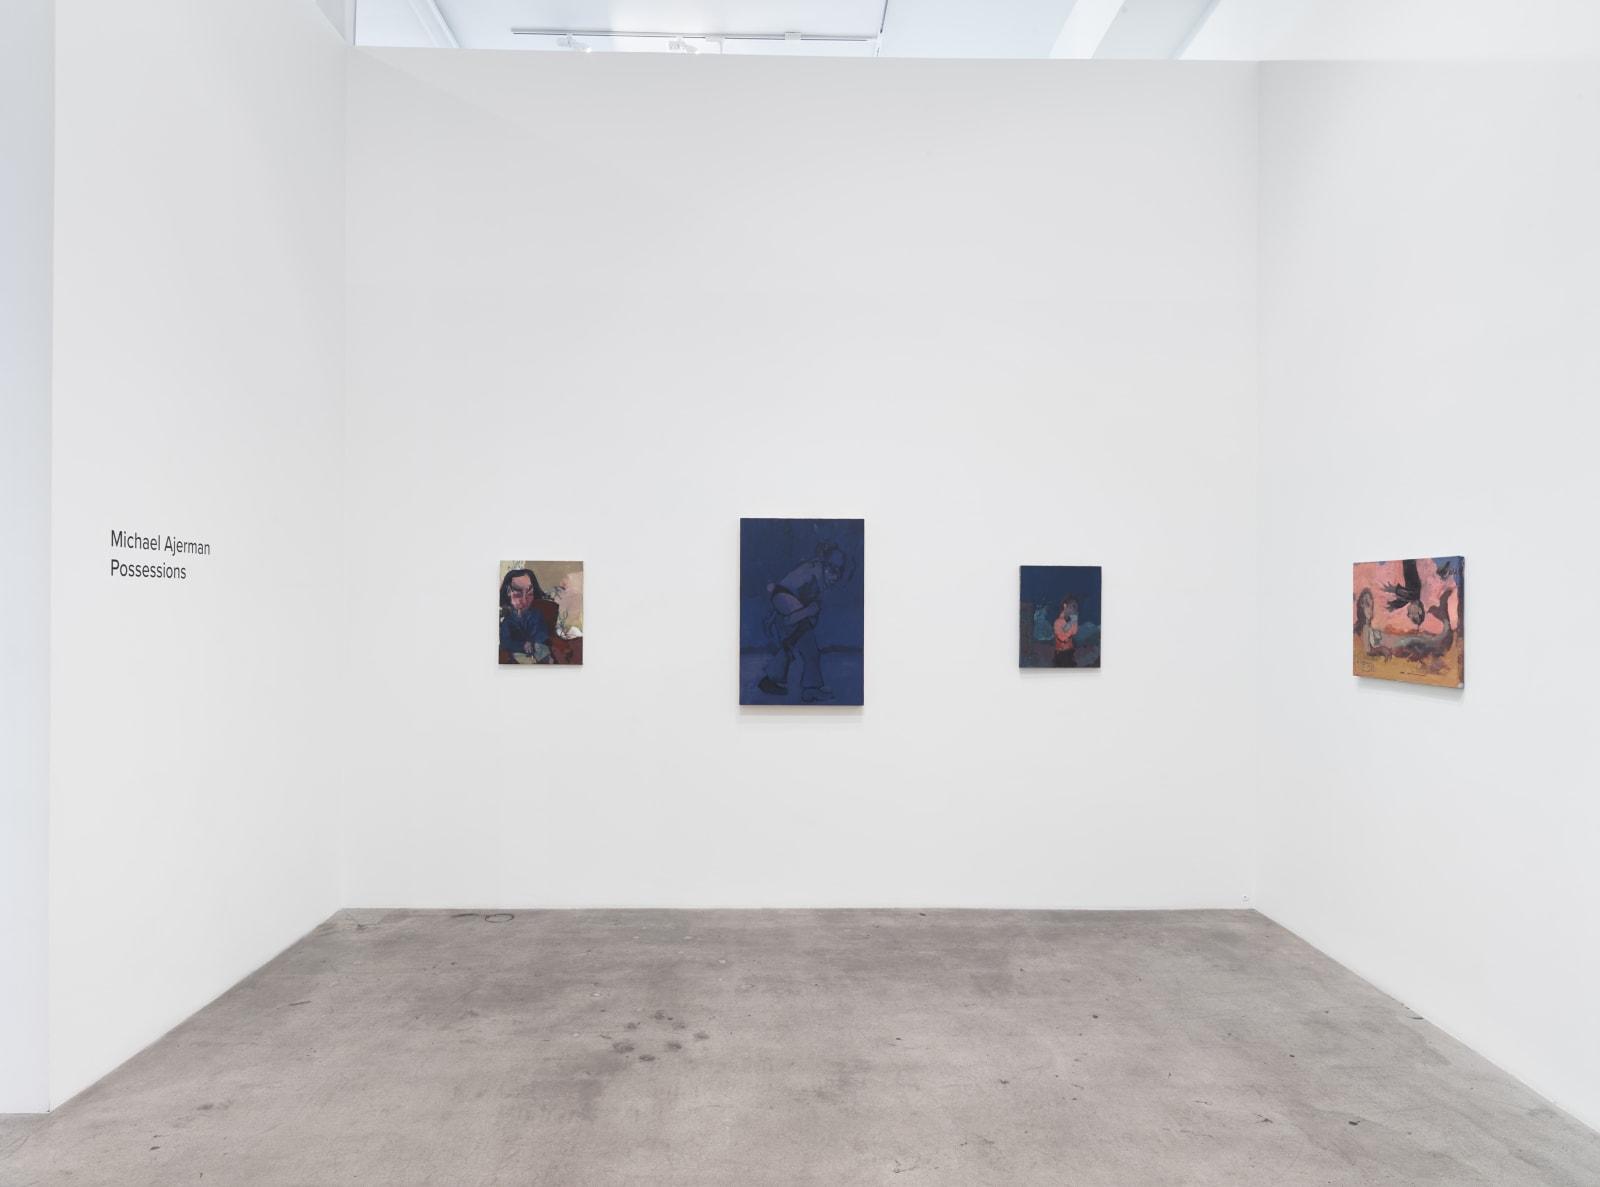 Michael Ajerman: Possessions